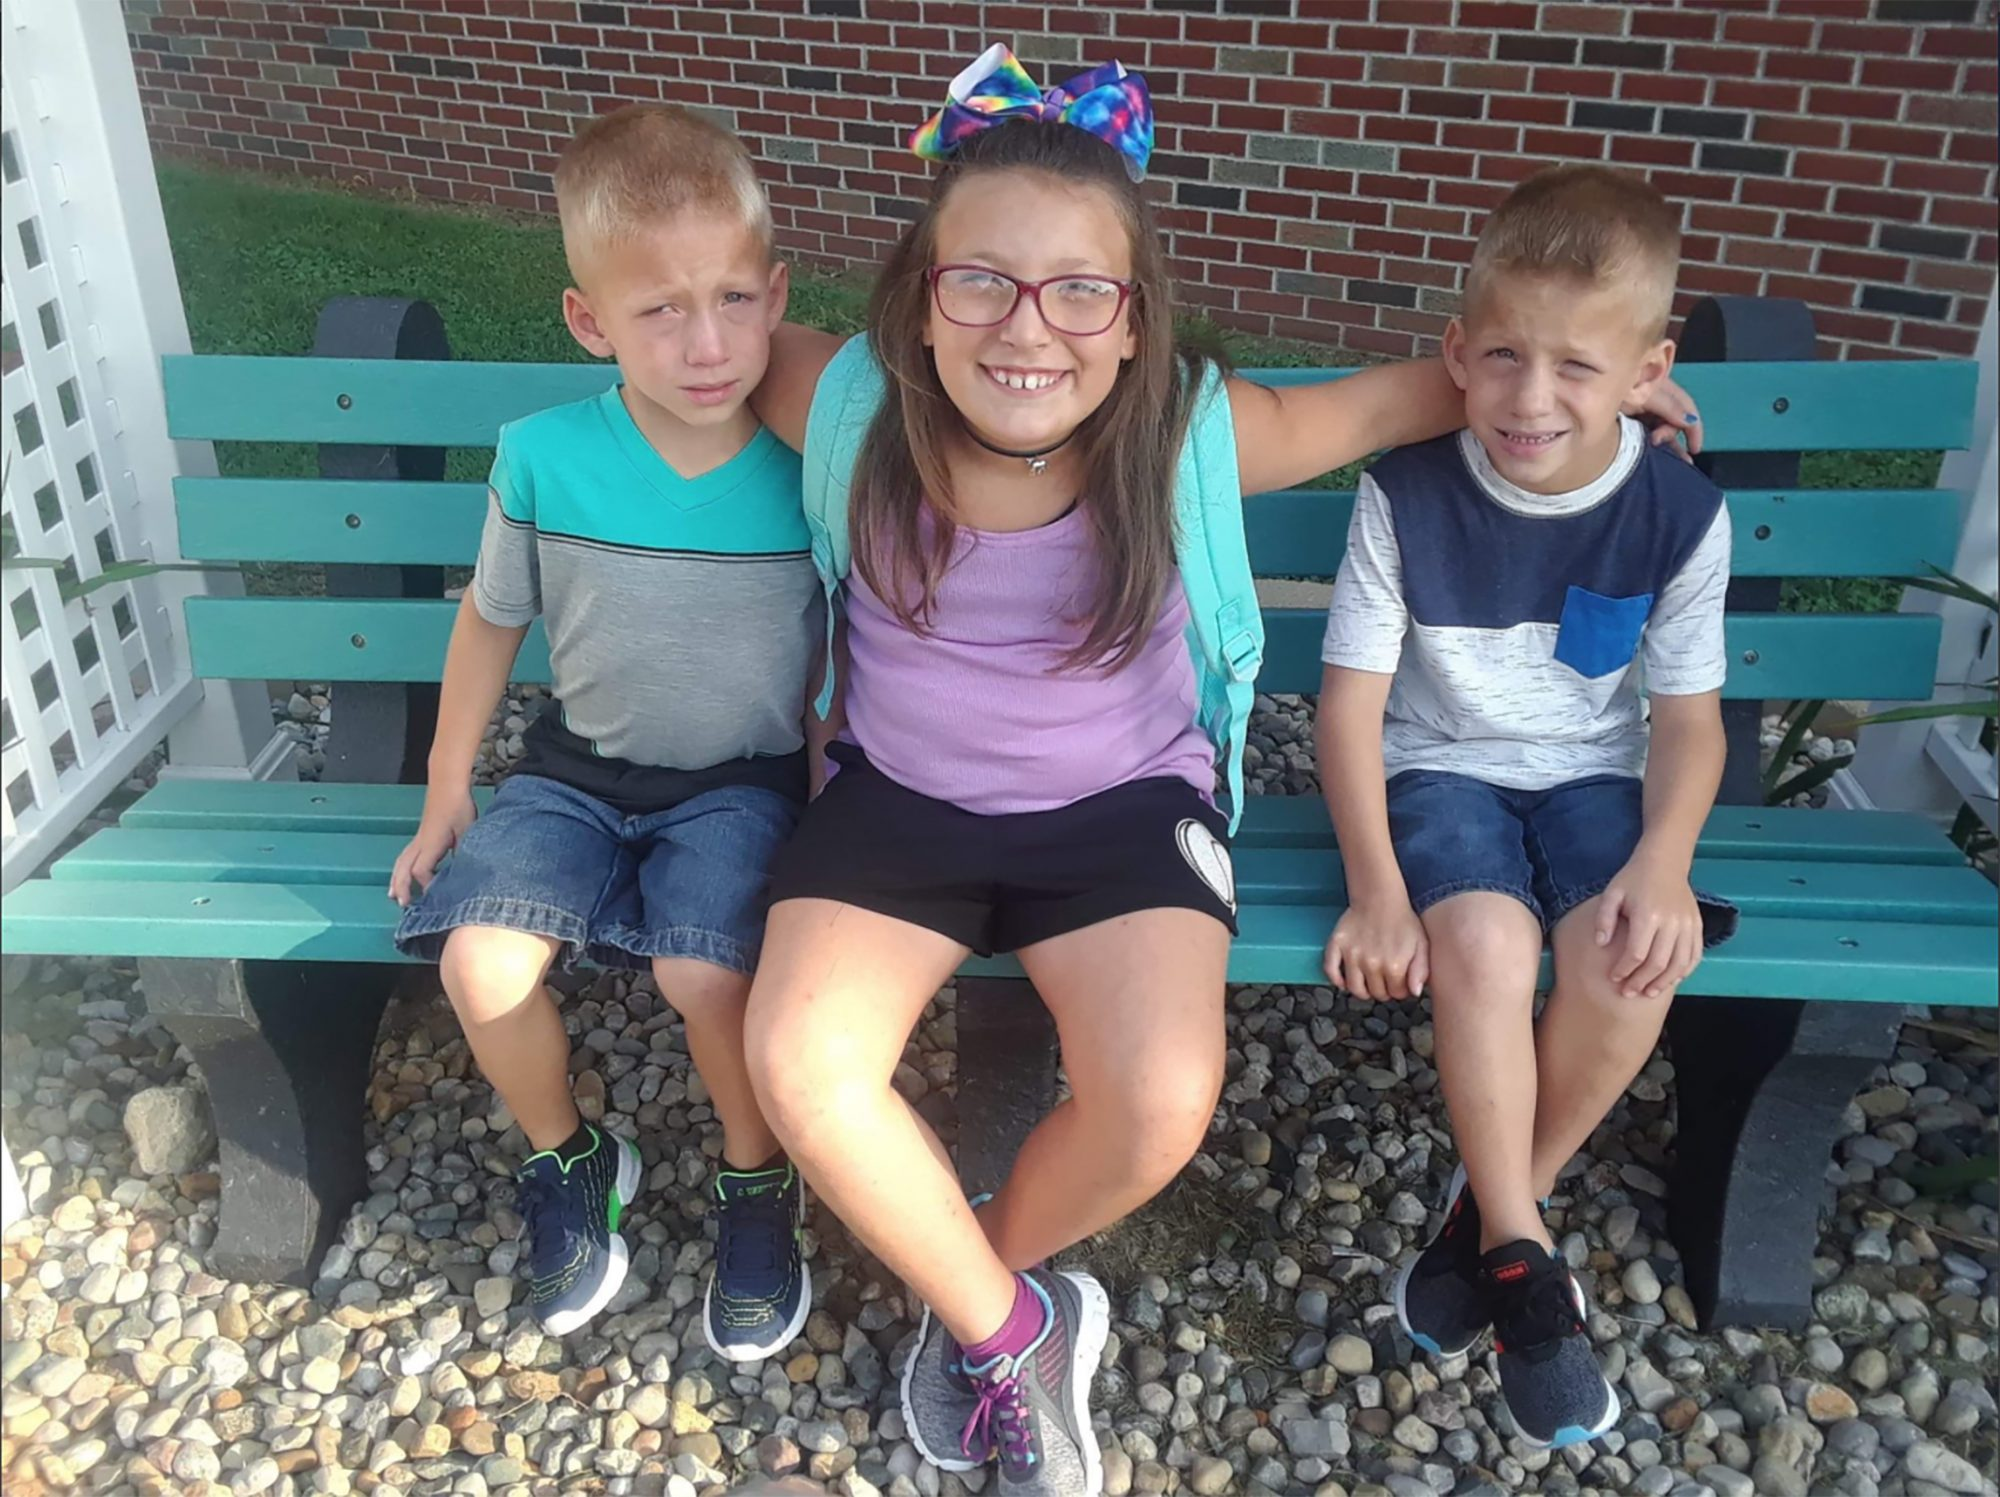 Xzavier, Mason Ingle, 6, y Alivia Stahl, 9